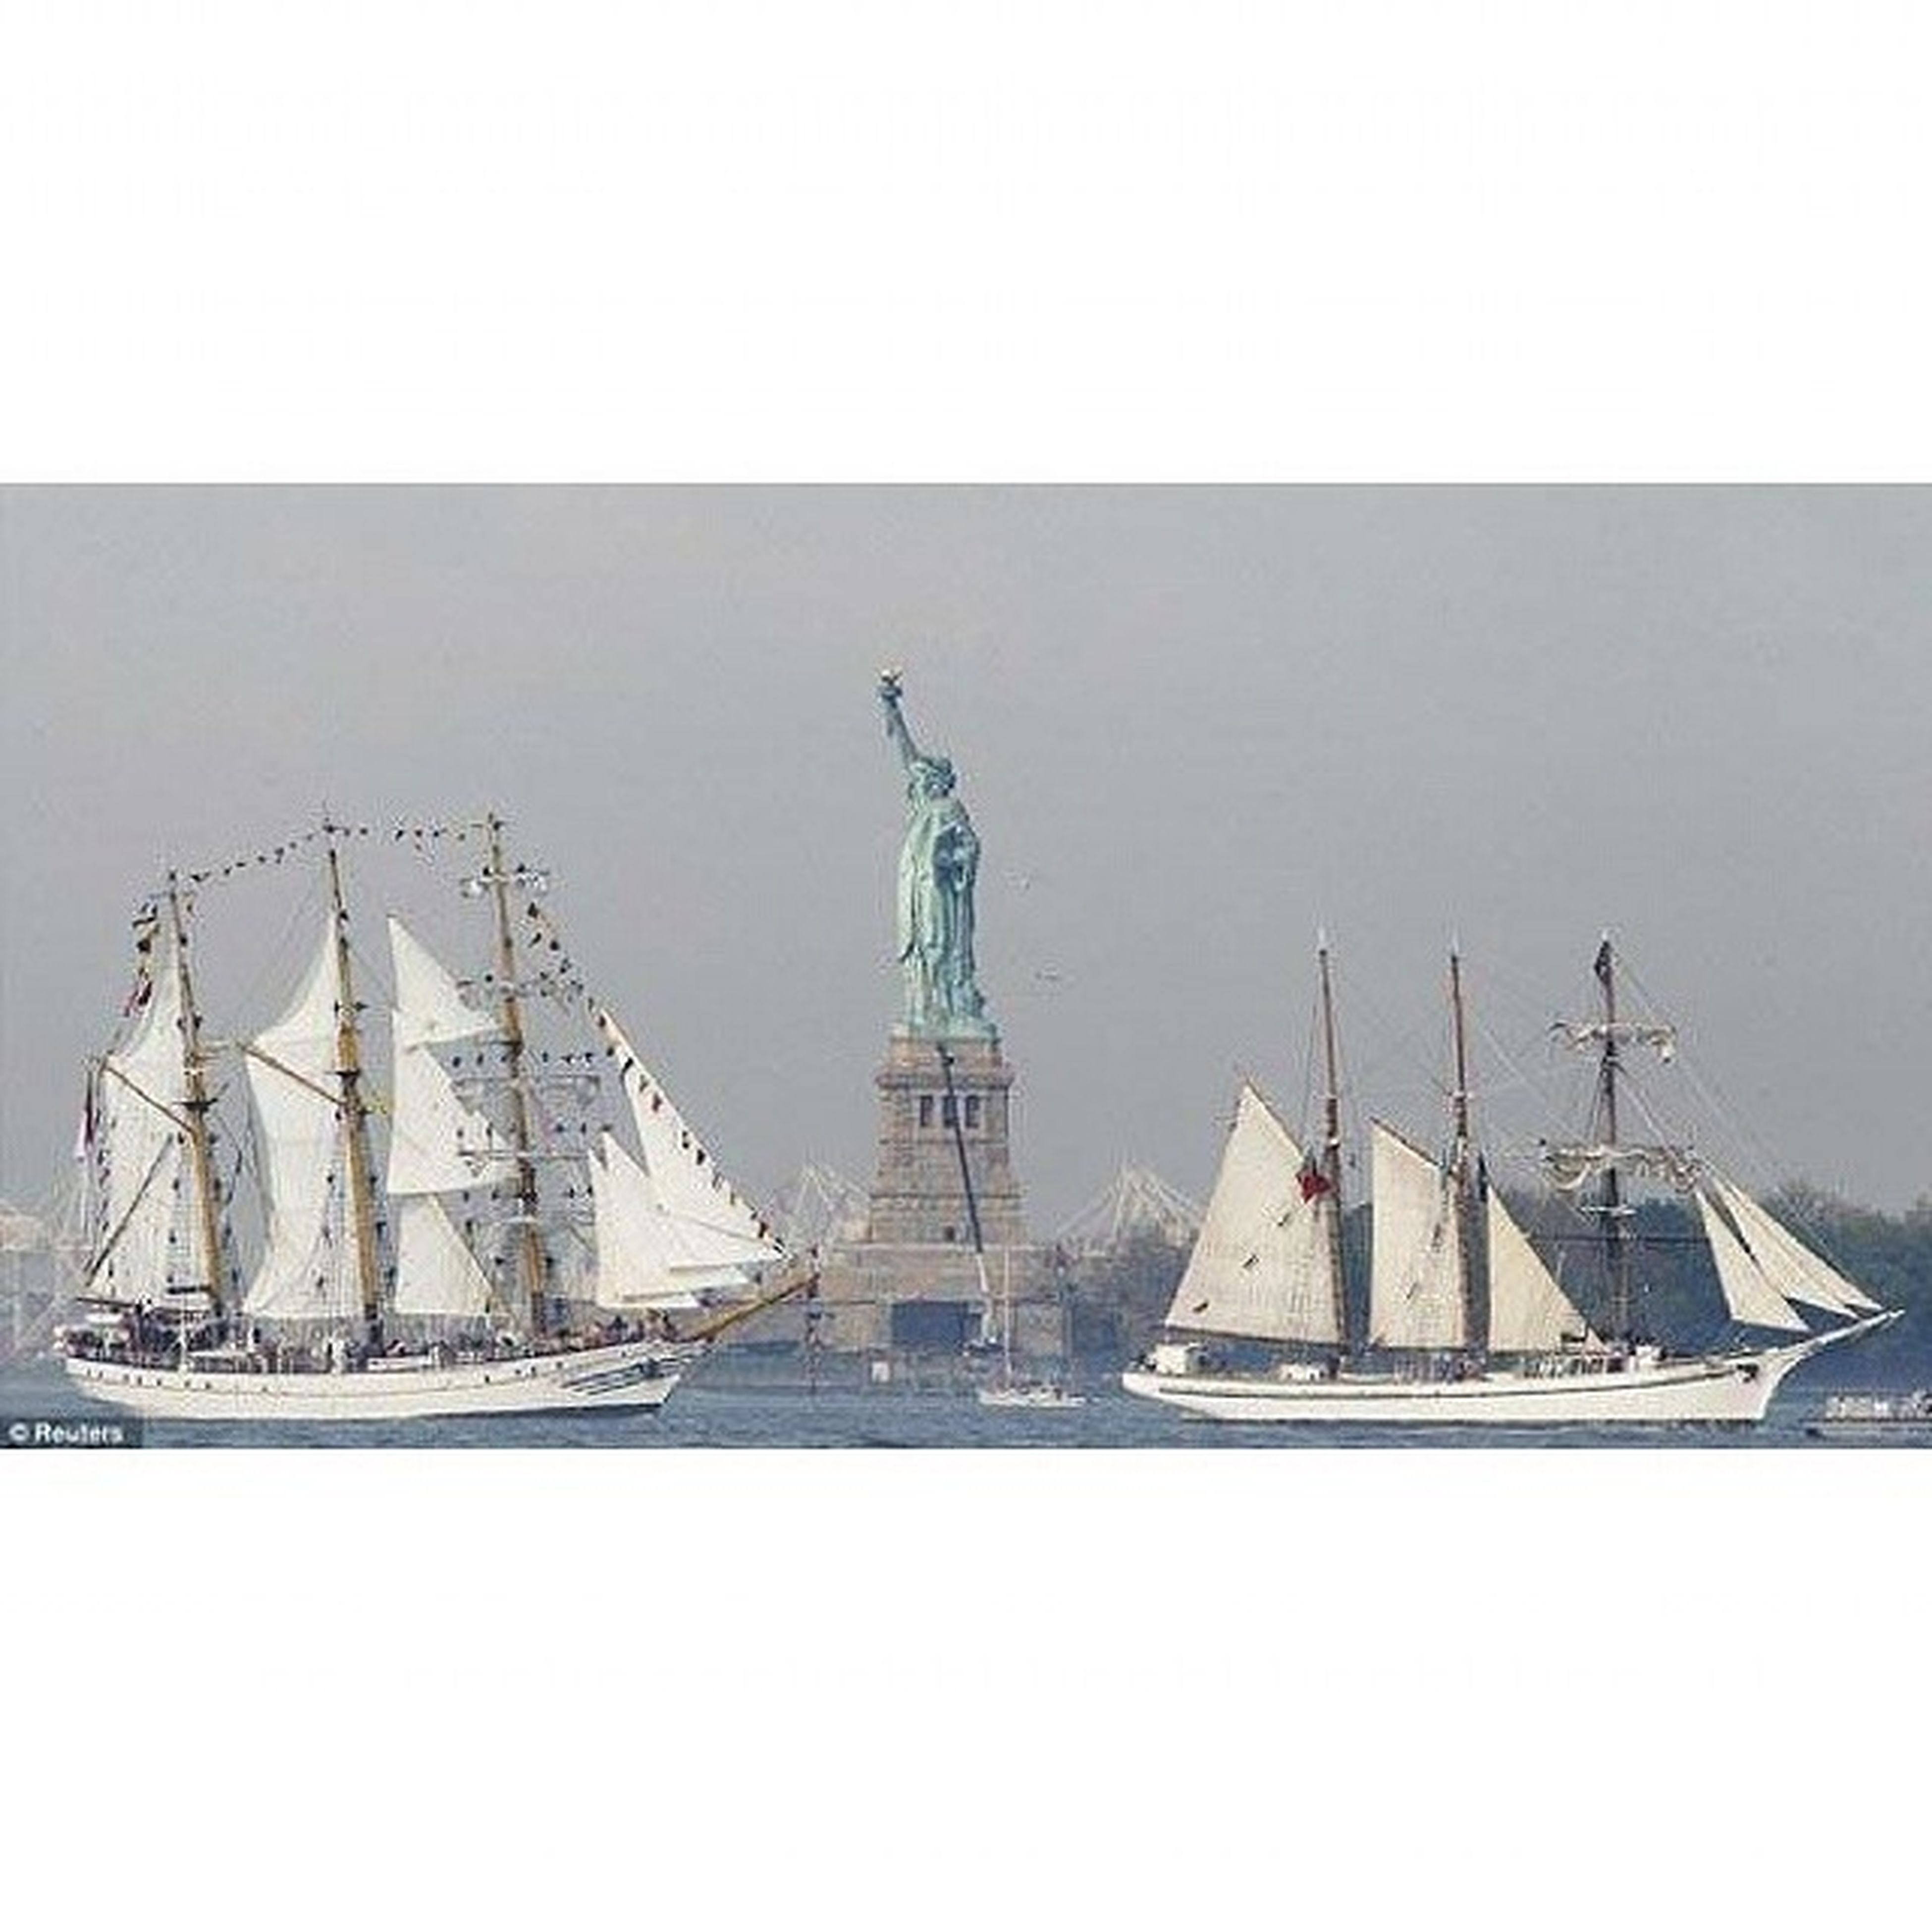 Sailling pass OpsailUSA2012 Latepost